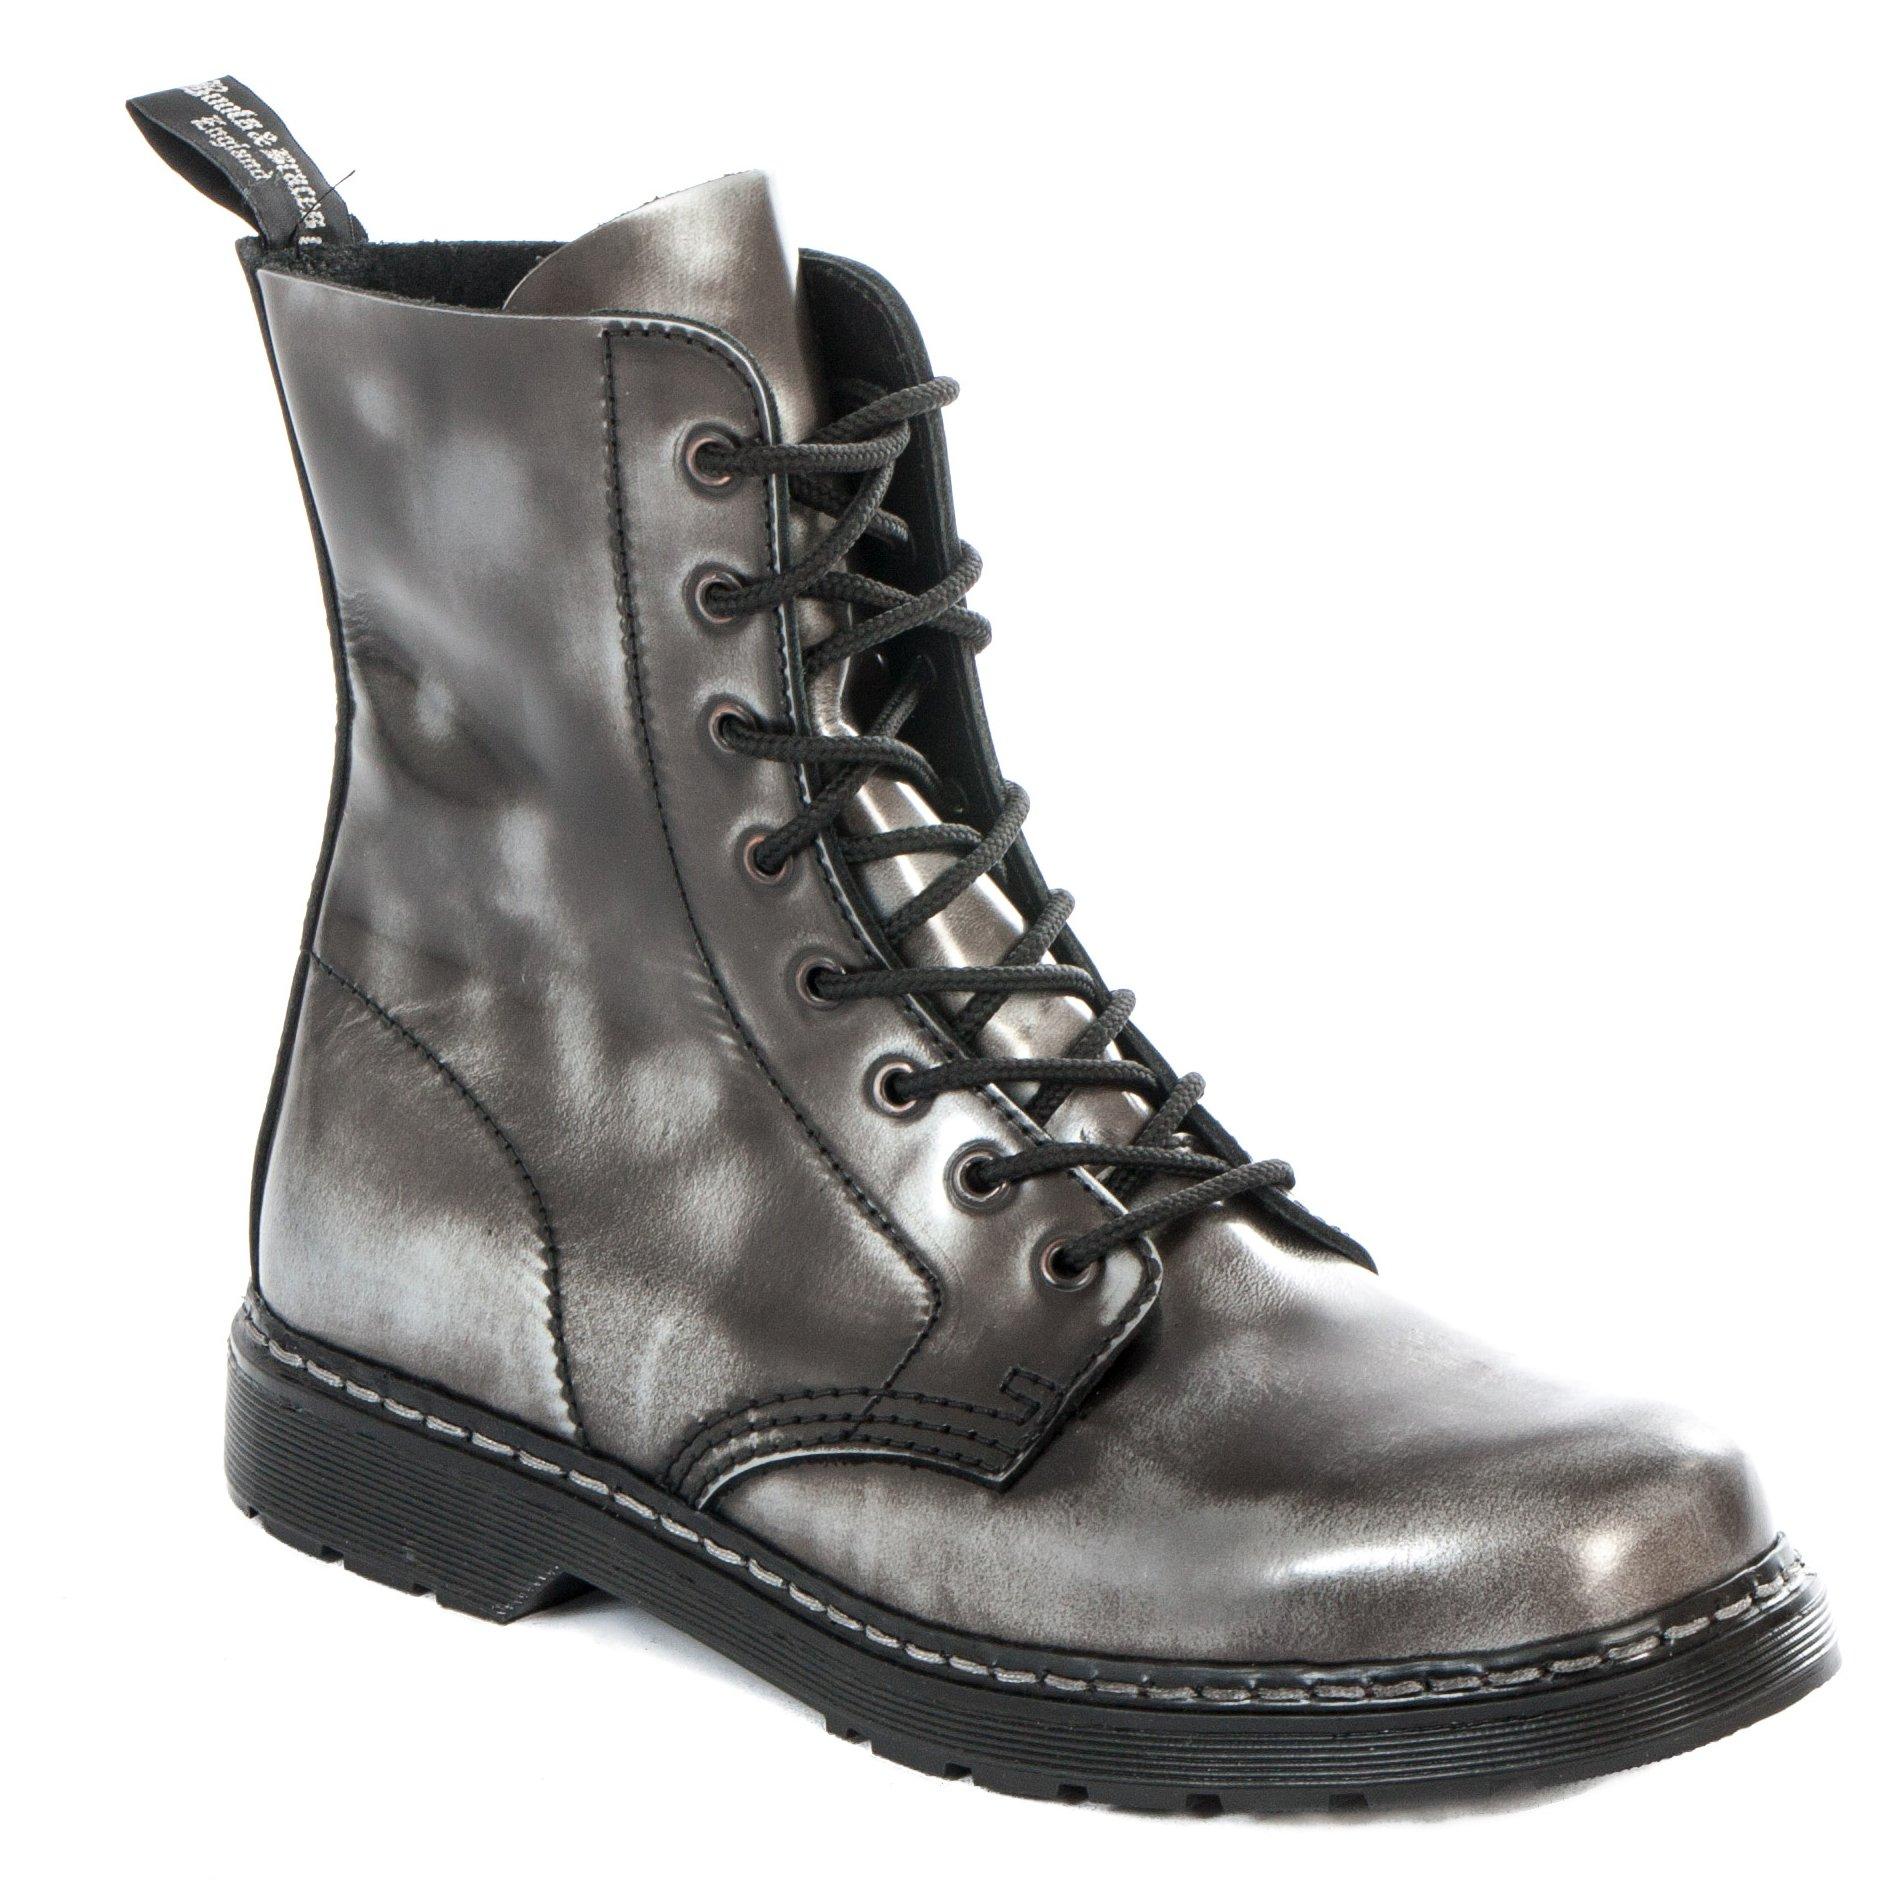 Boots & Braces Easy 8 Loch Silver Rub Off schwarz Stiefel Rangers Schwarz